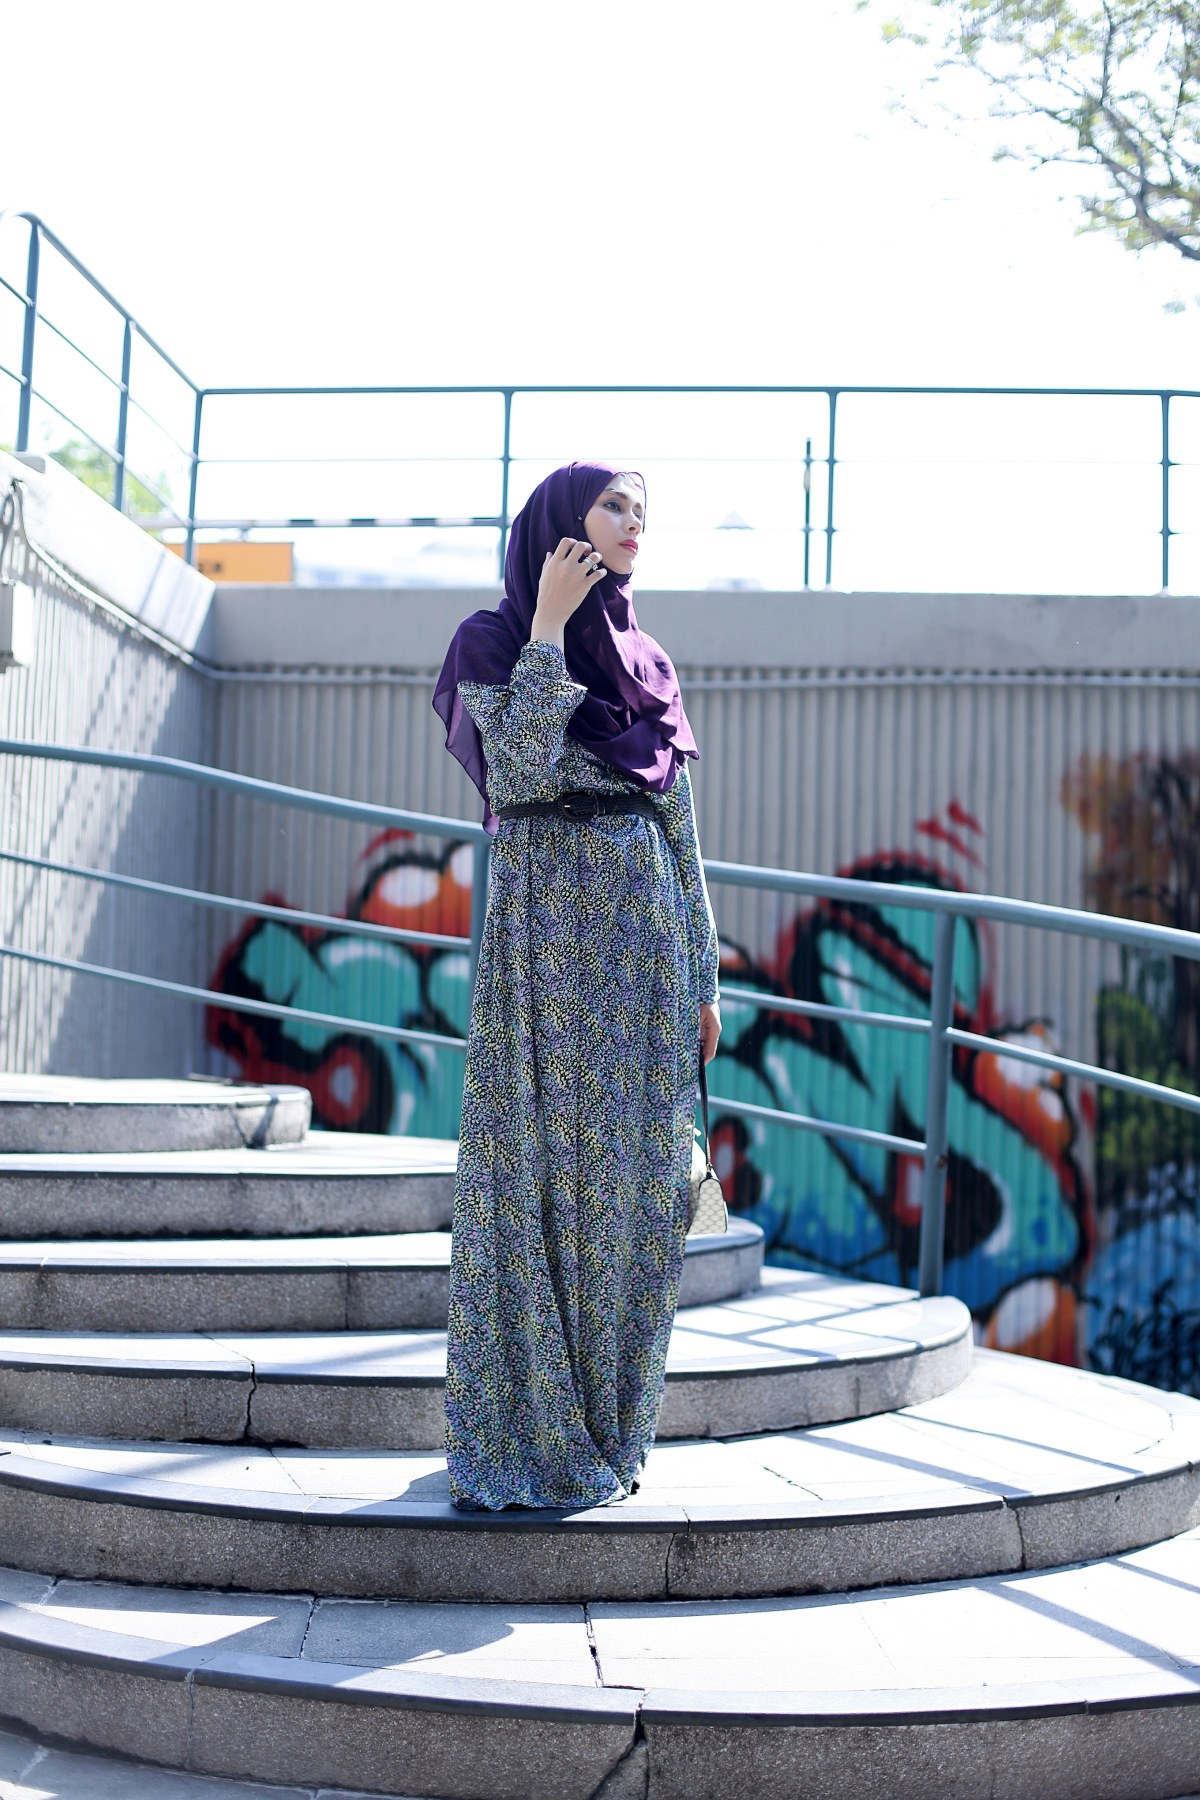 Ide Fashion Muslimah Q5df Muslimah Fashion – My Own Style